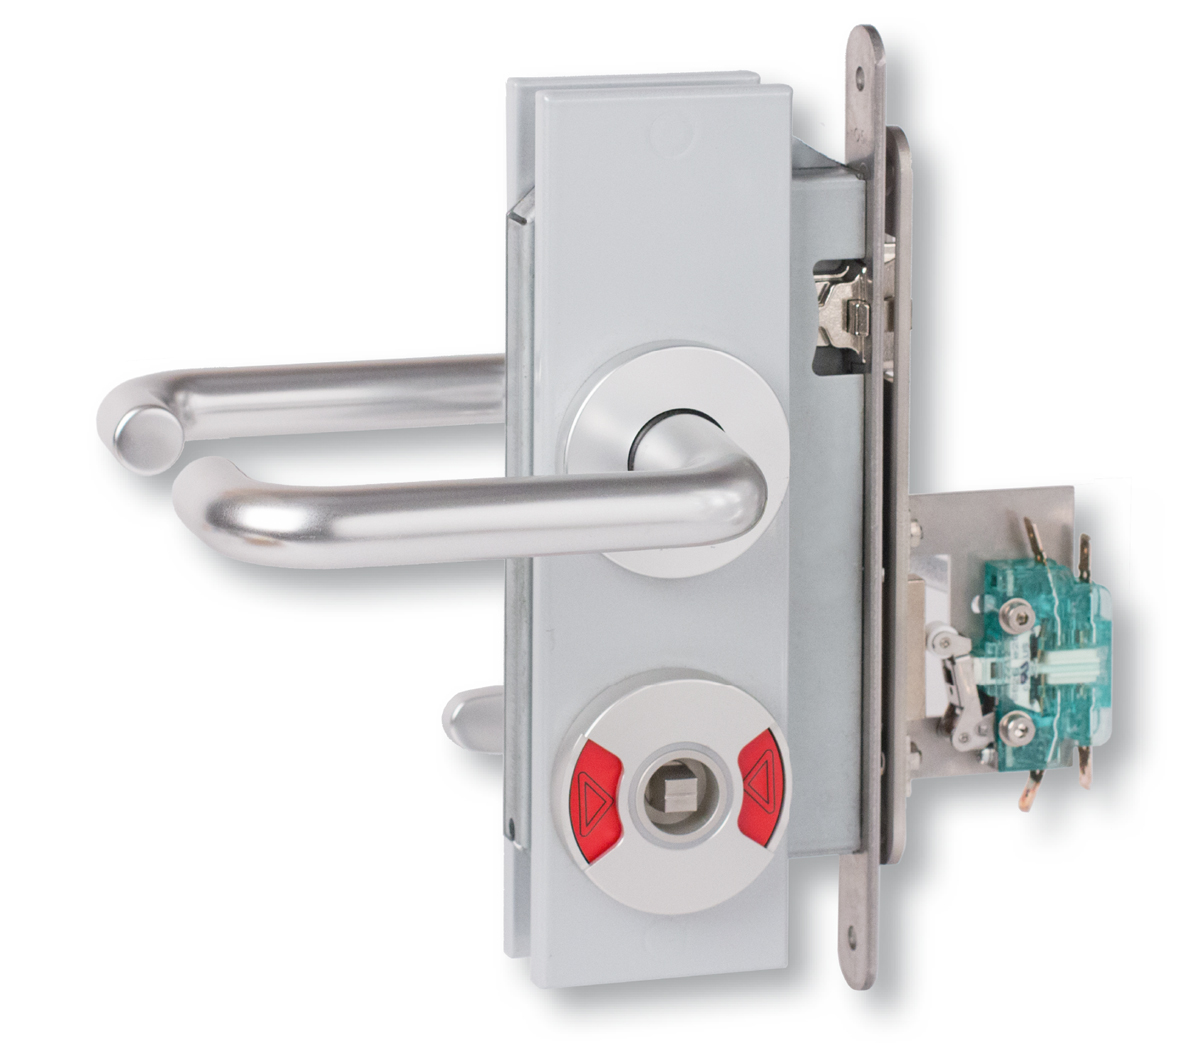 kasper elektronik | WC-Schloss für Drehtüren